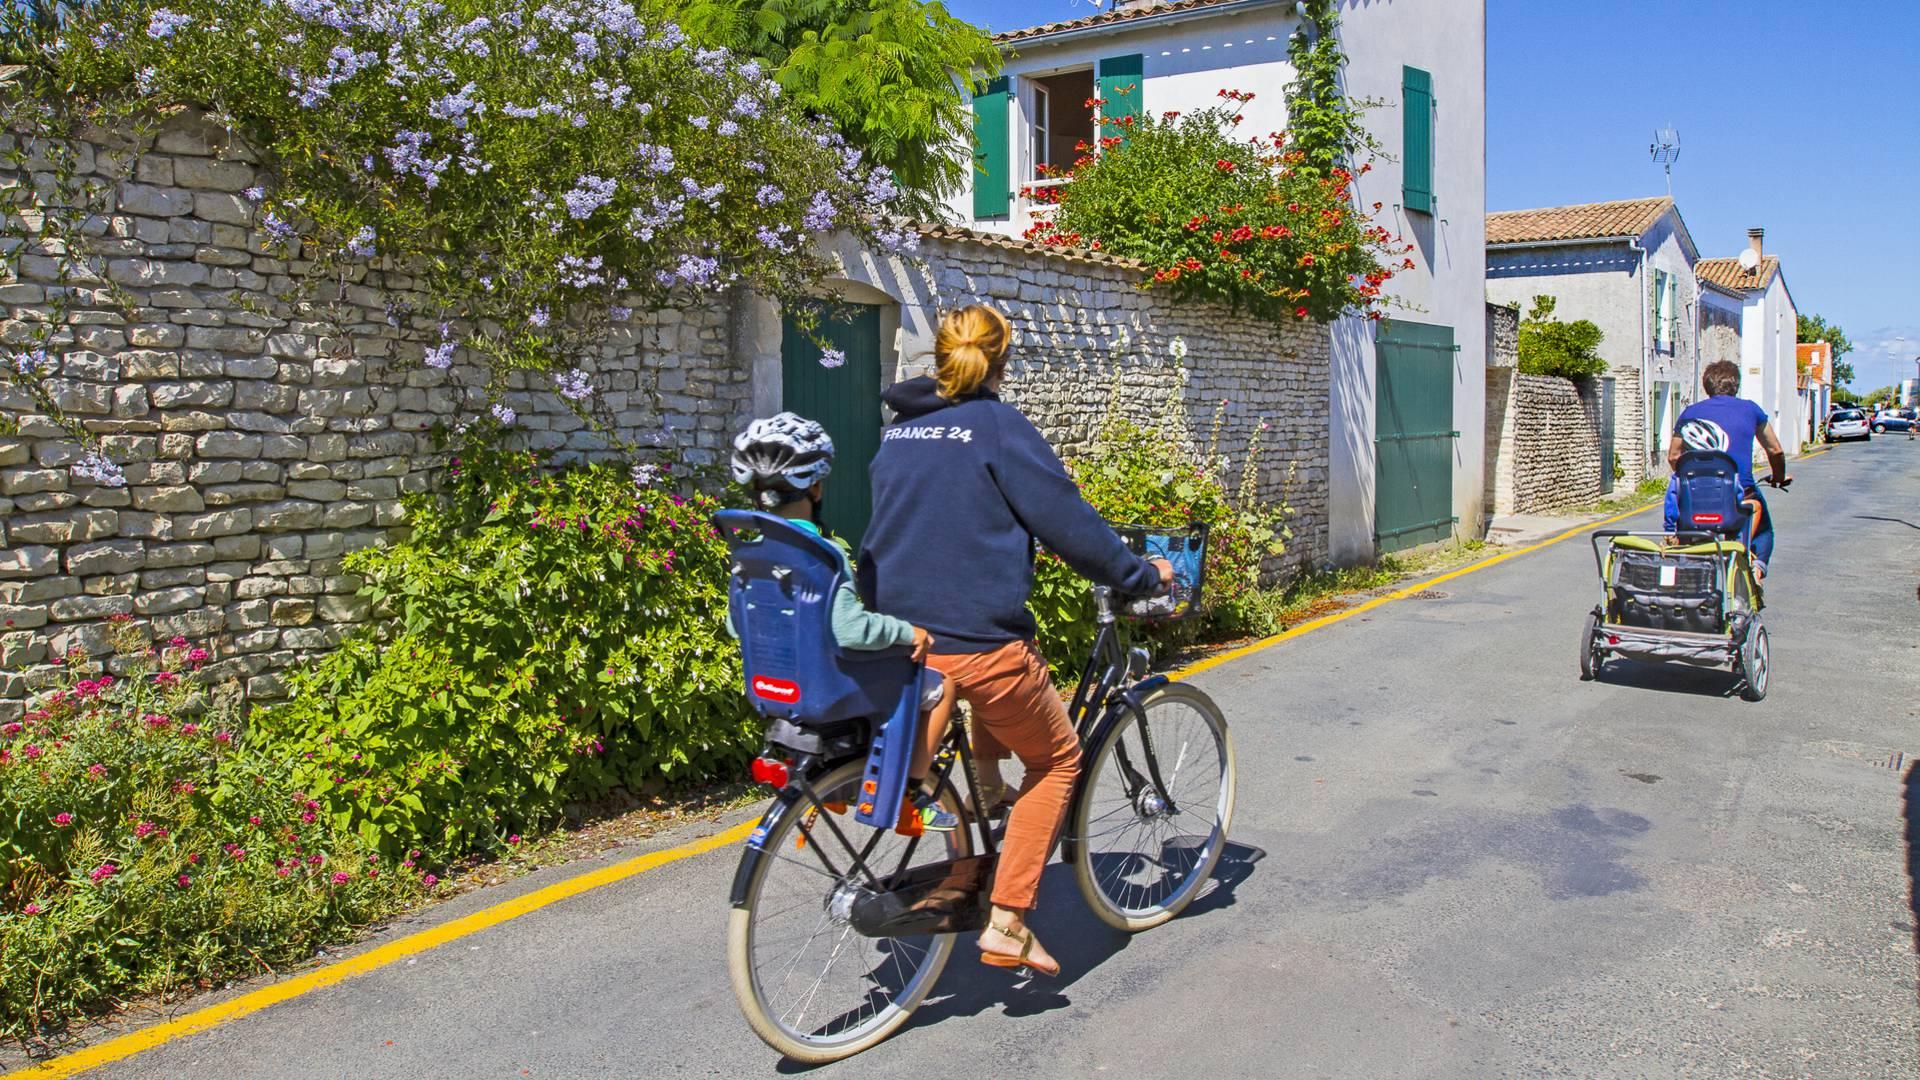 Family bike ride by François Blanchard